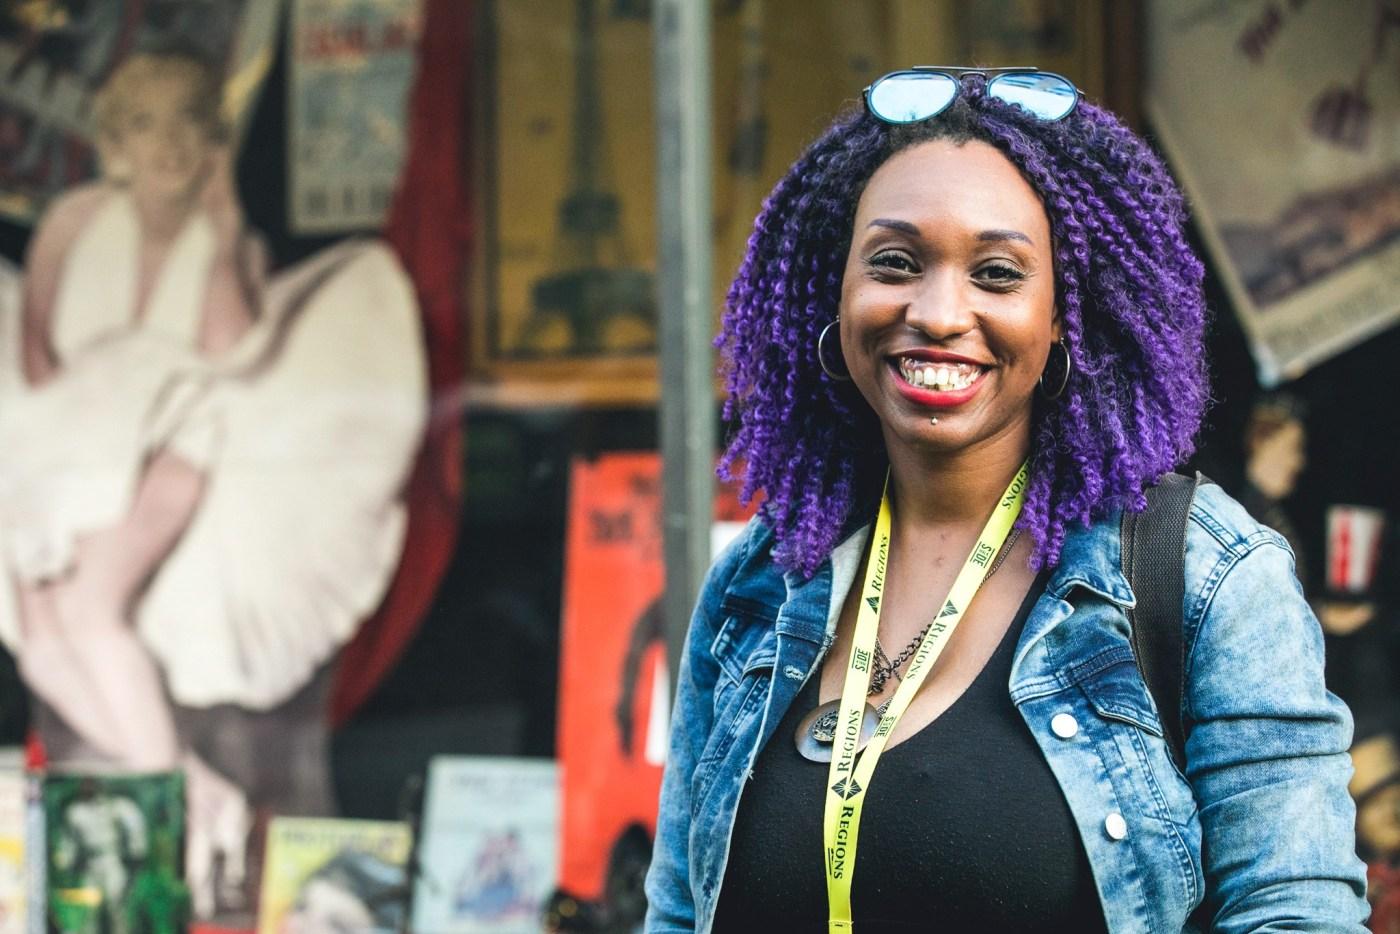 Sidewalk supports local artists of all backgrounds. Photo via Sidewalk Film Festival